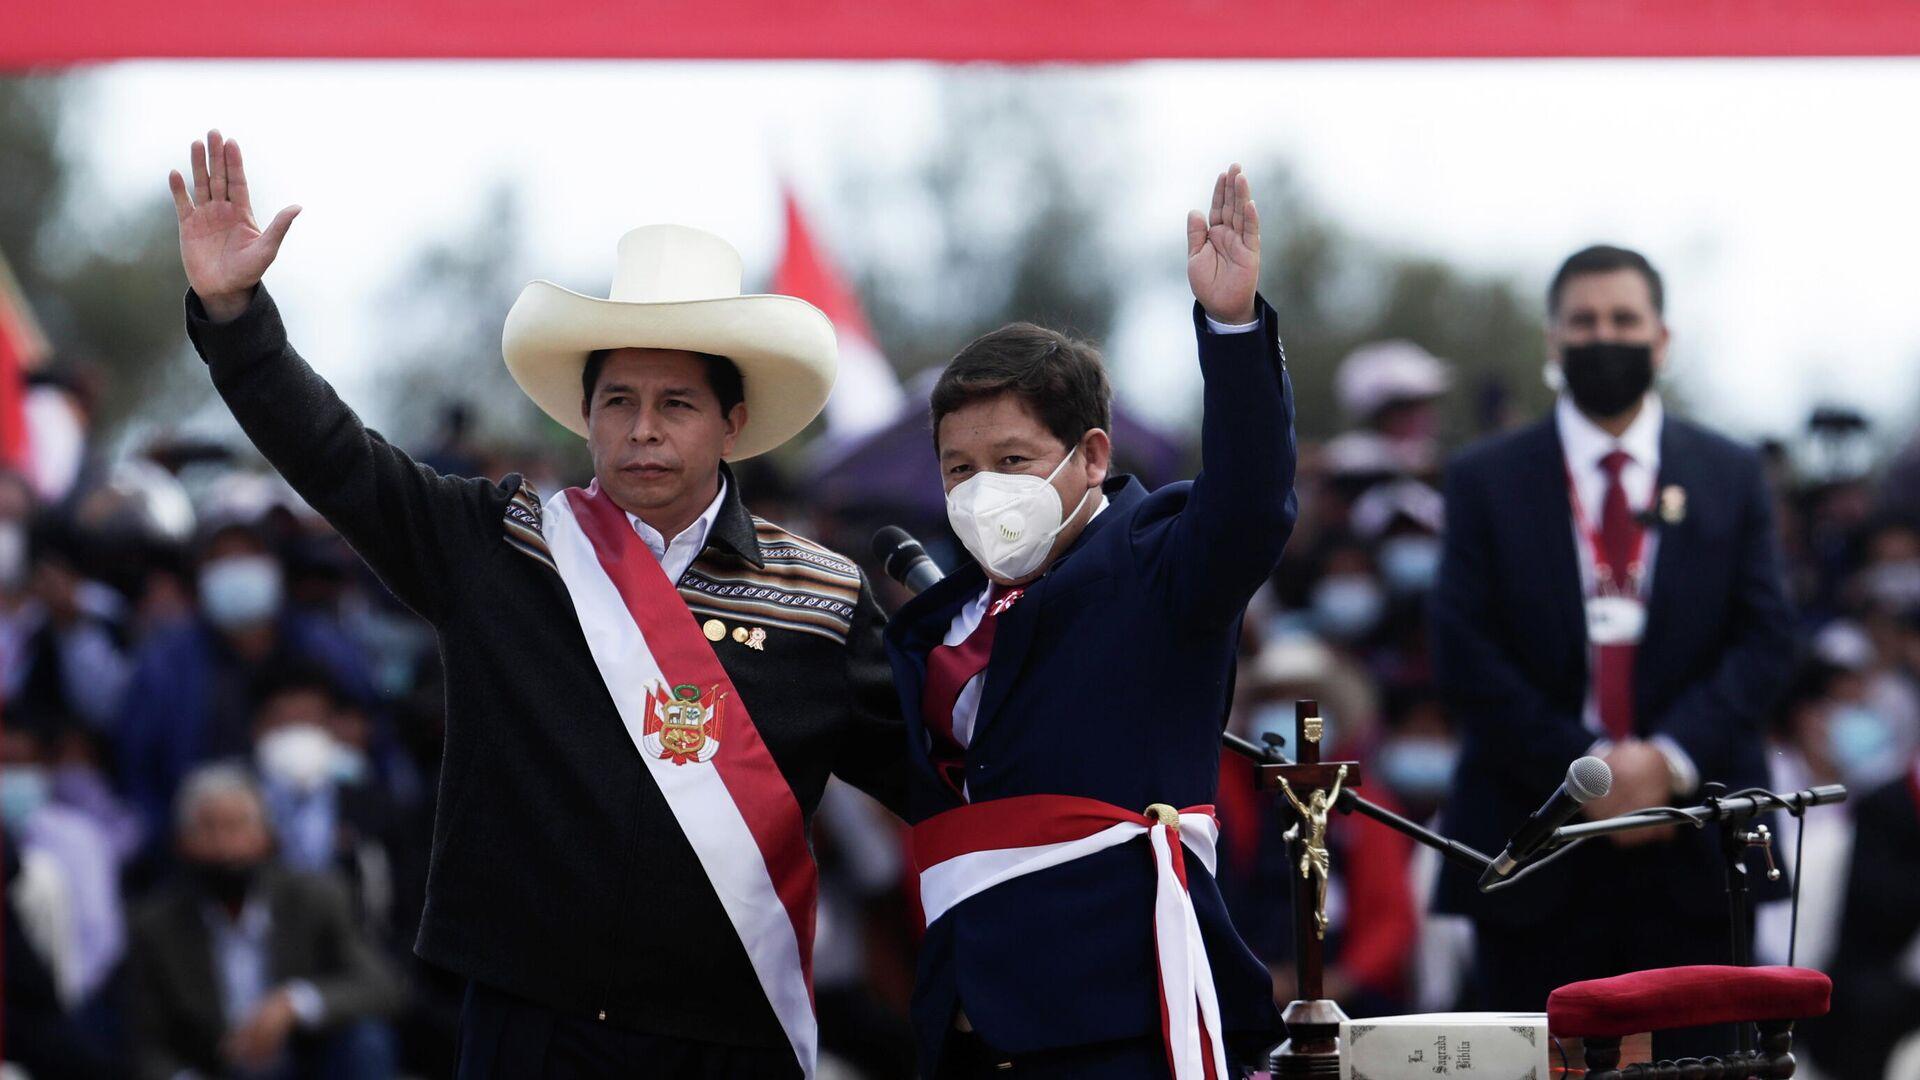 El presidente de Perú, Pedro Castillo, junto al primer ministro, Guido Bellido  - Sputnik Mundo, 1920, 27.08.2021